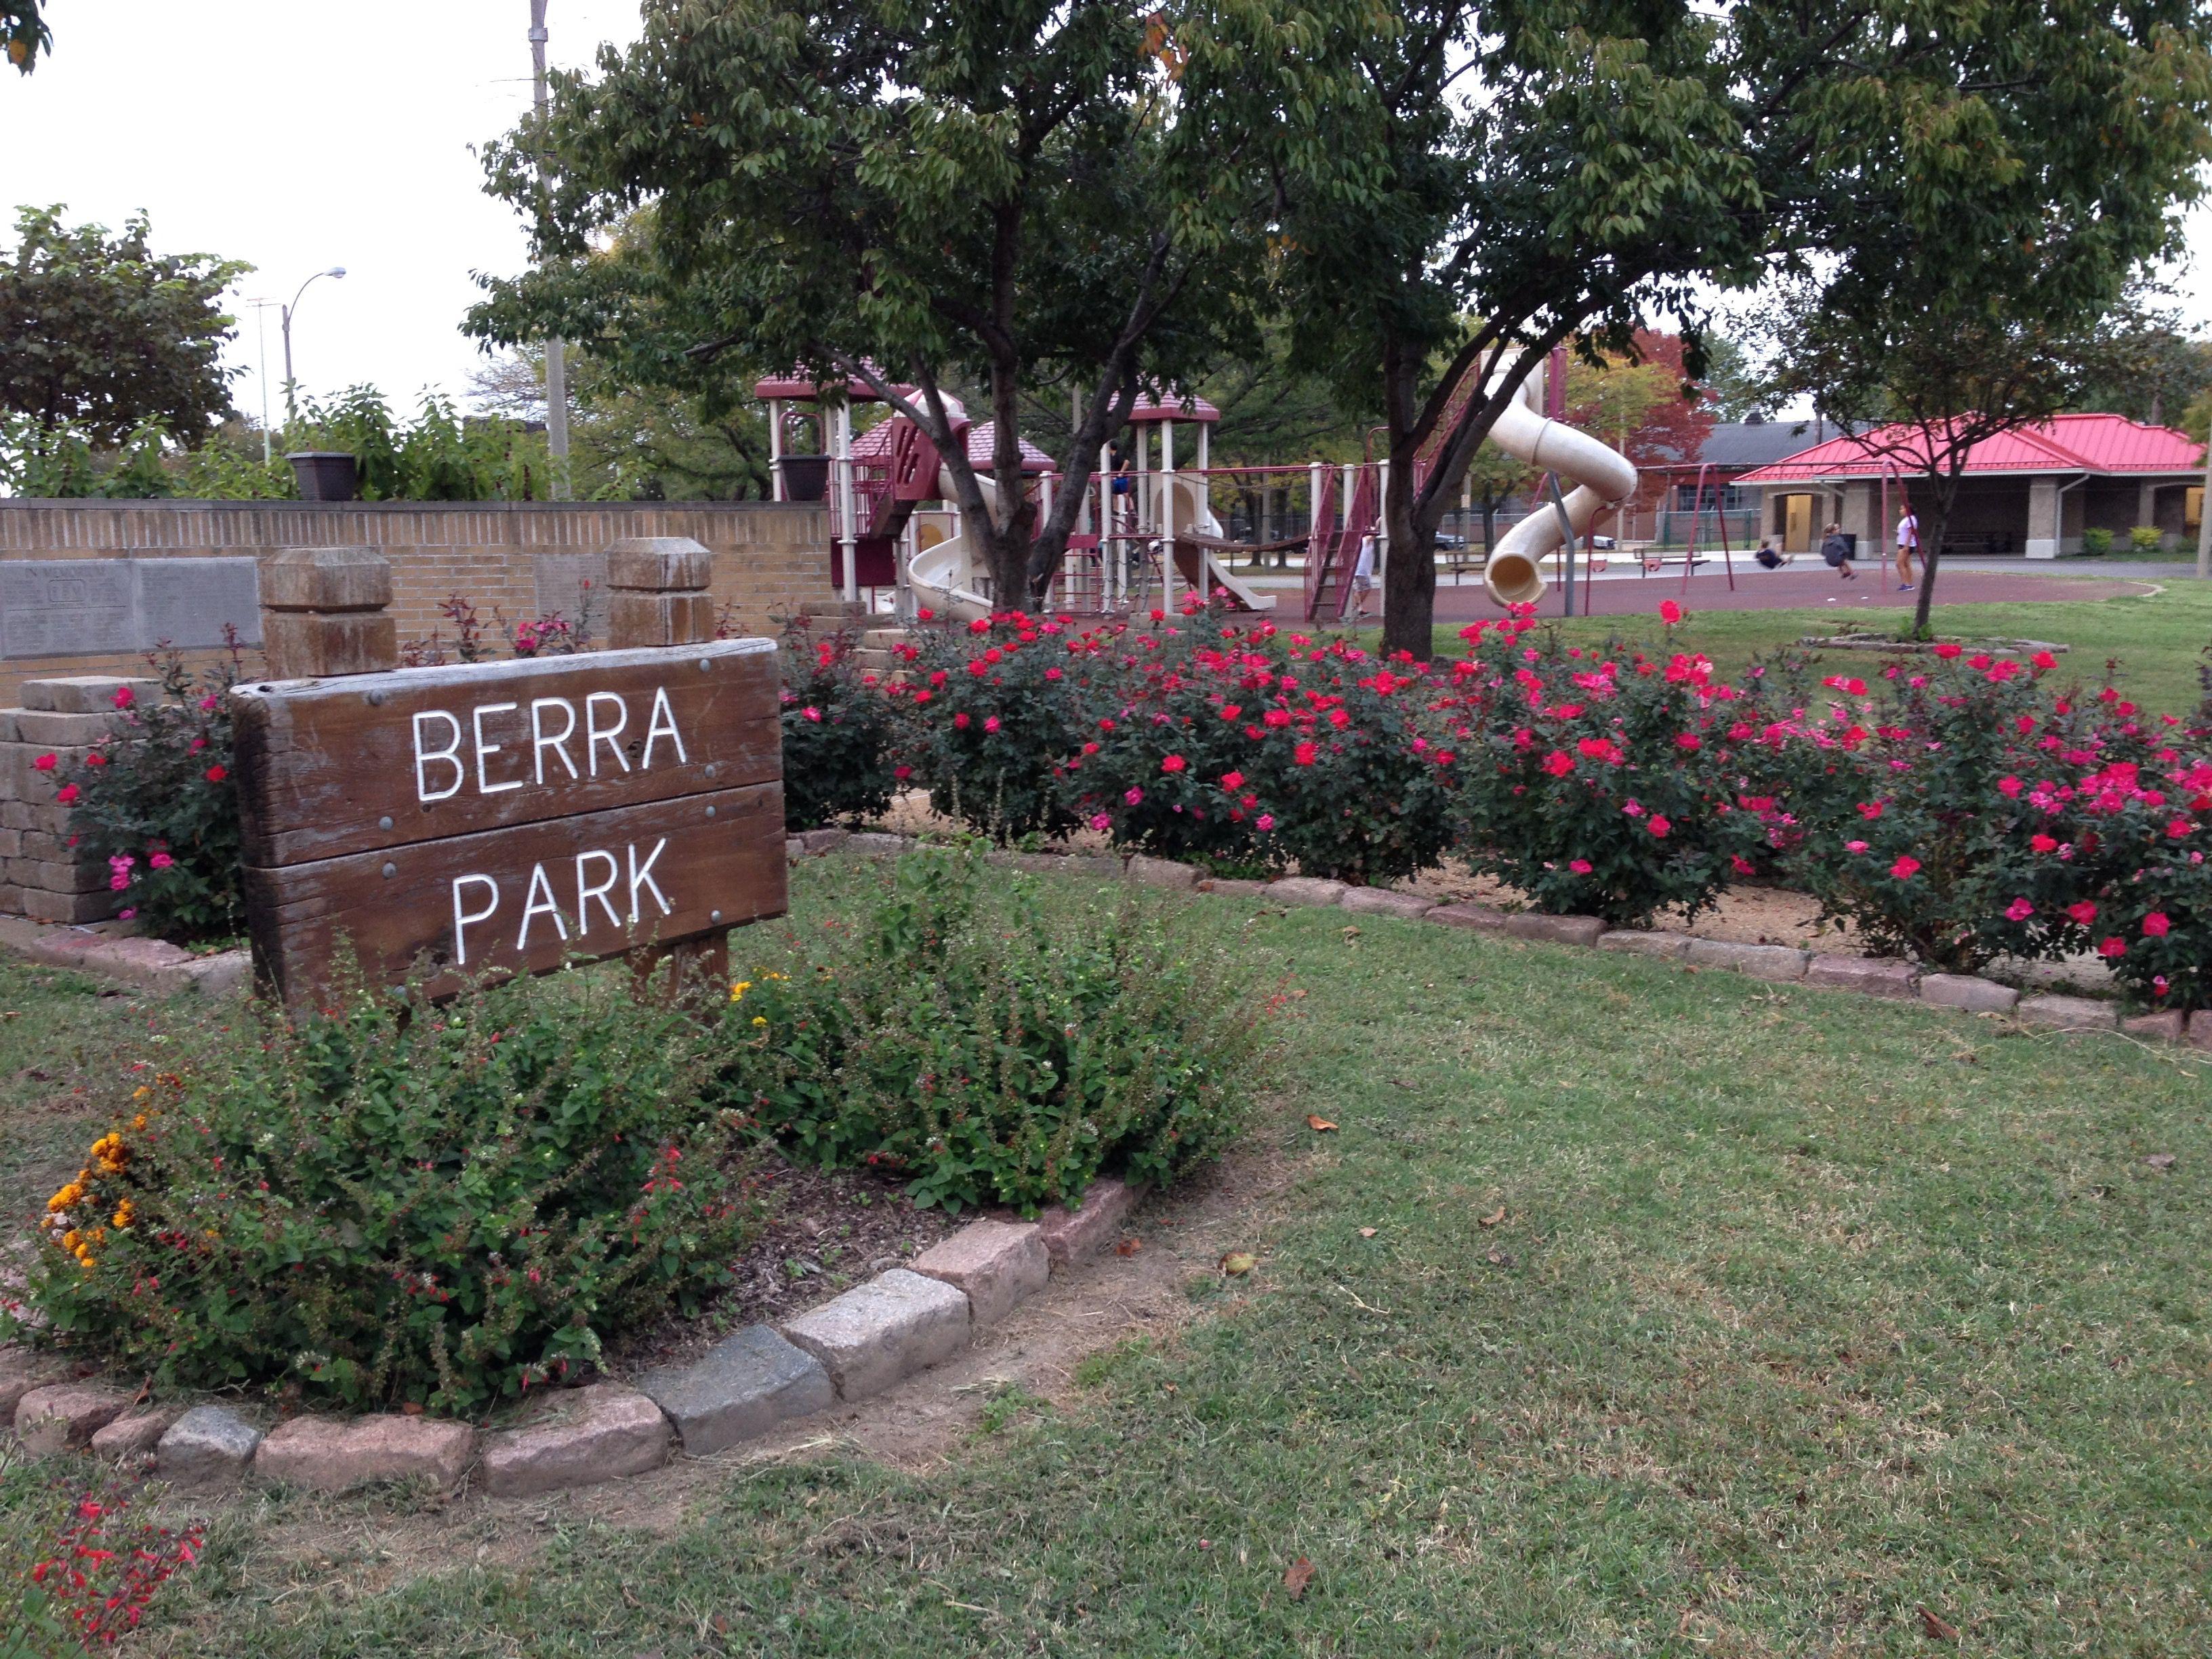 Berra Park on The Hill